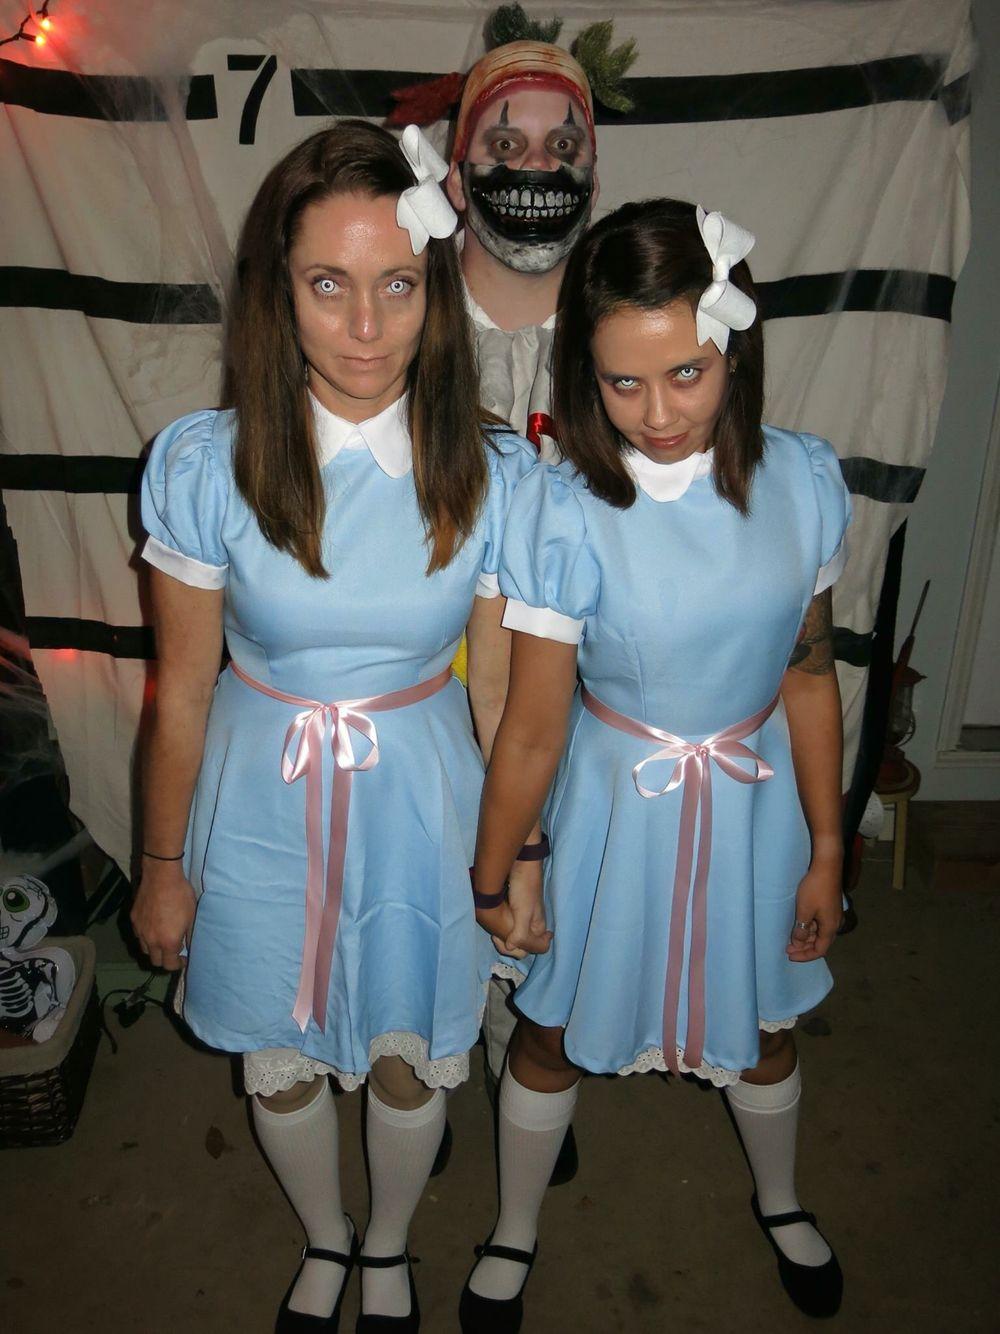 Grady twins costume gradytwins halloween diy